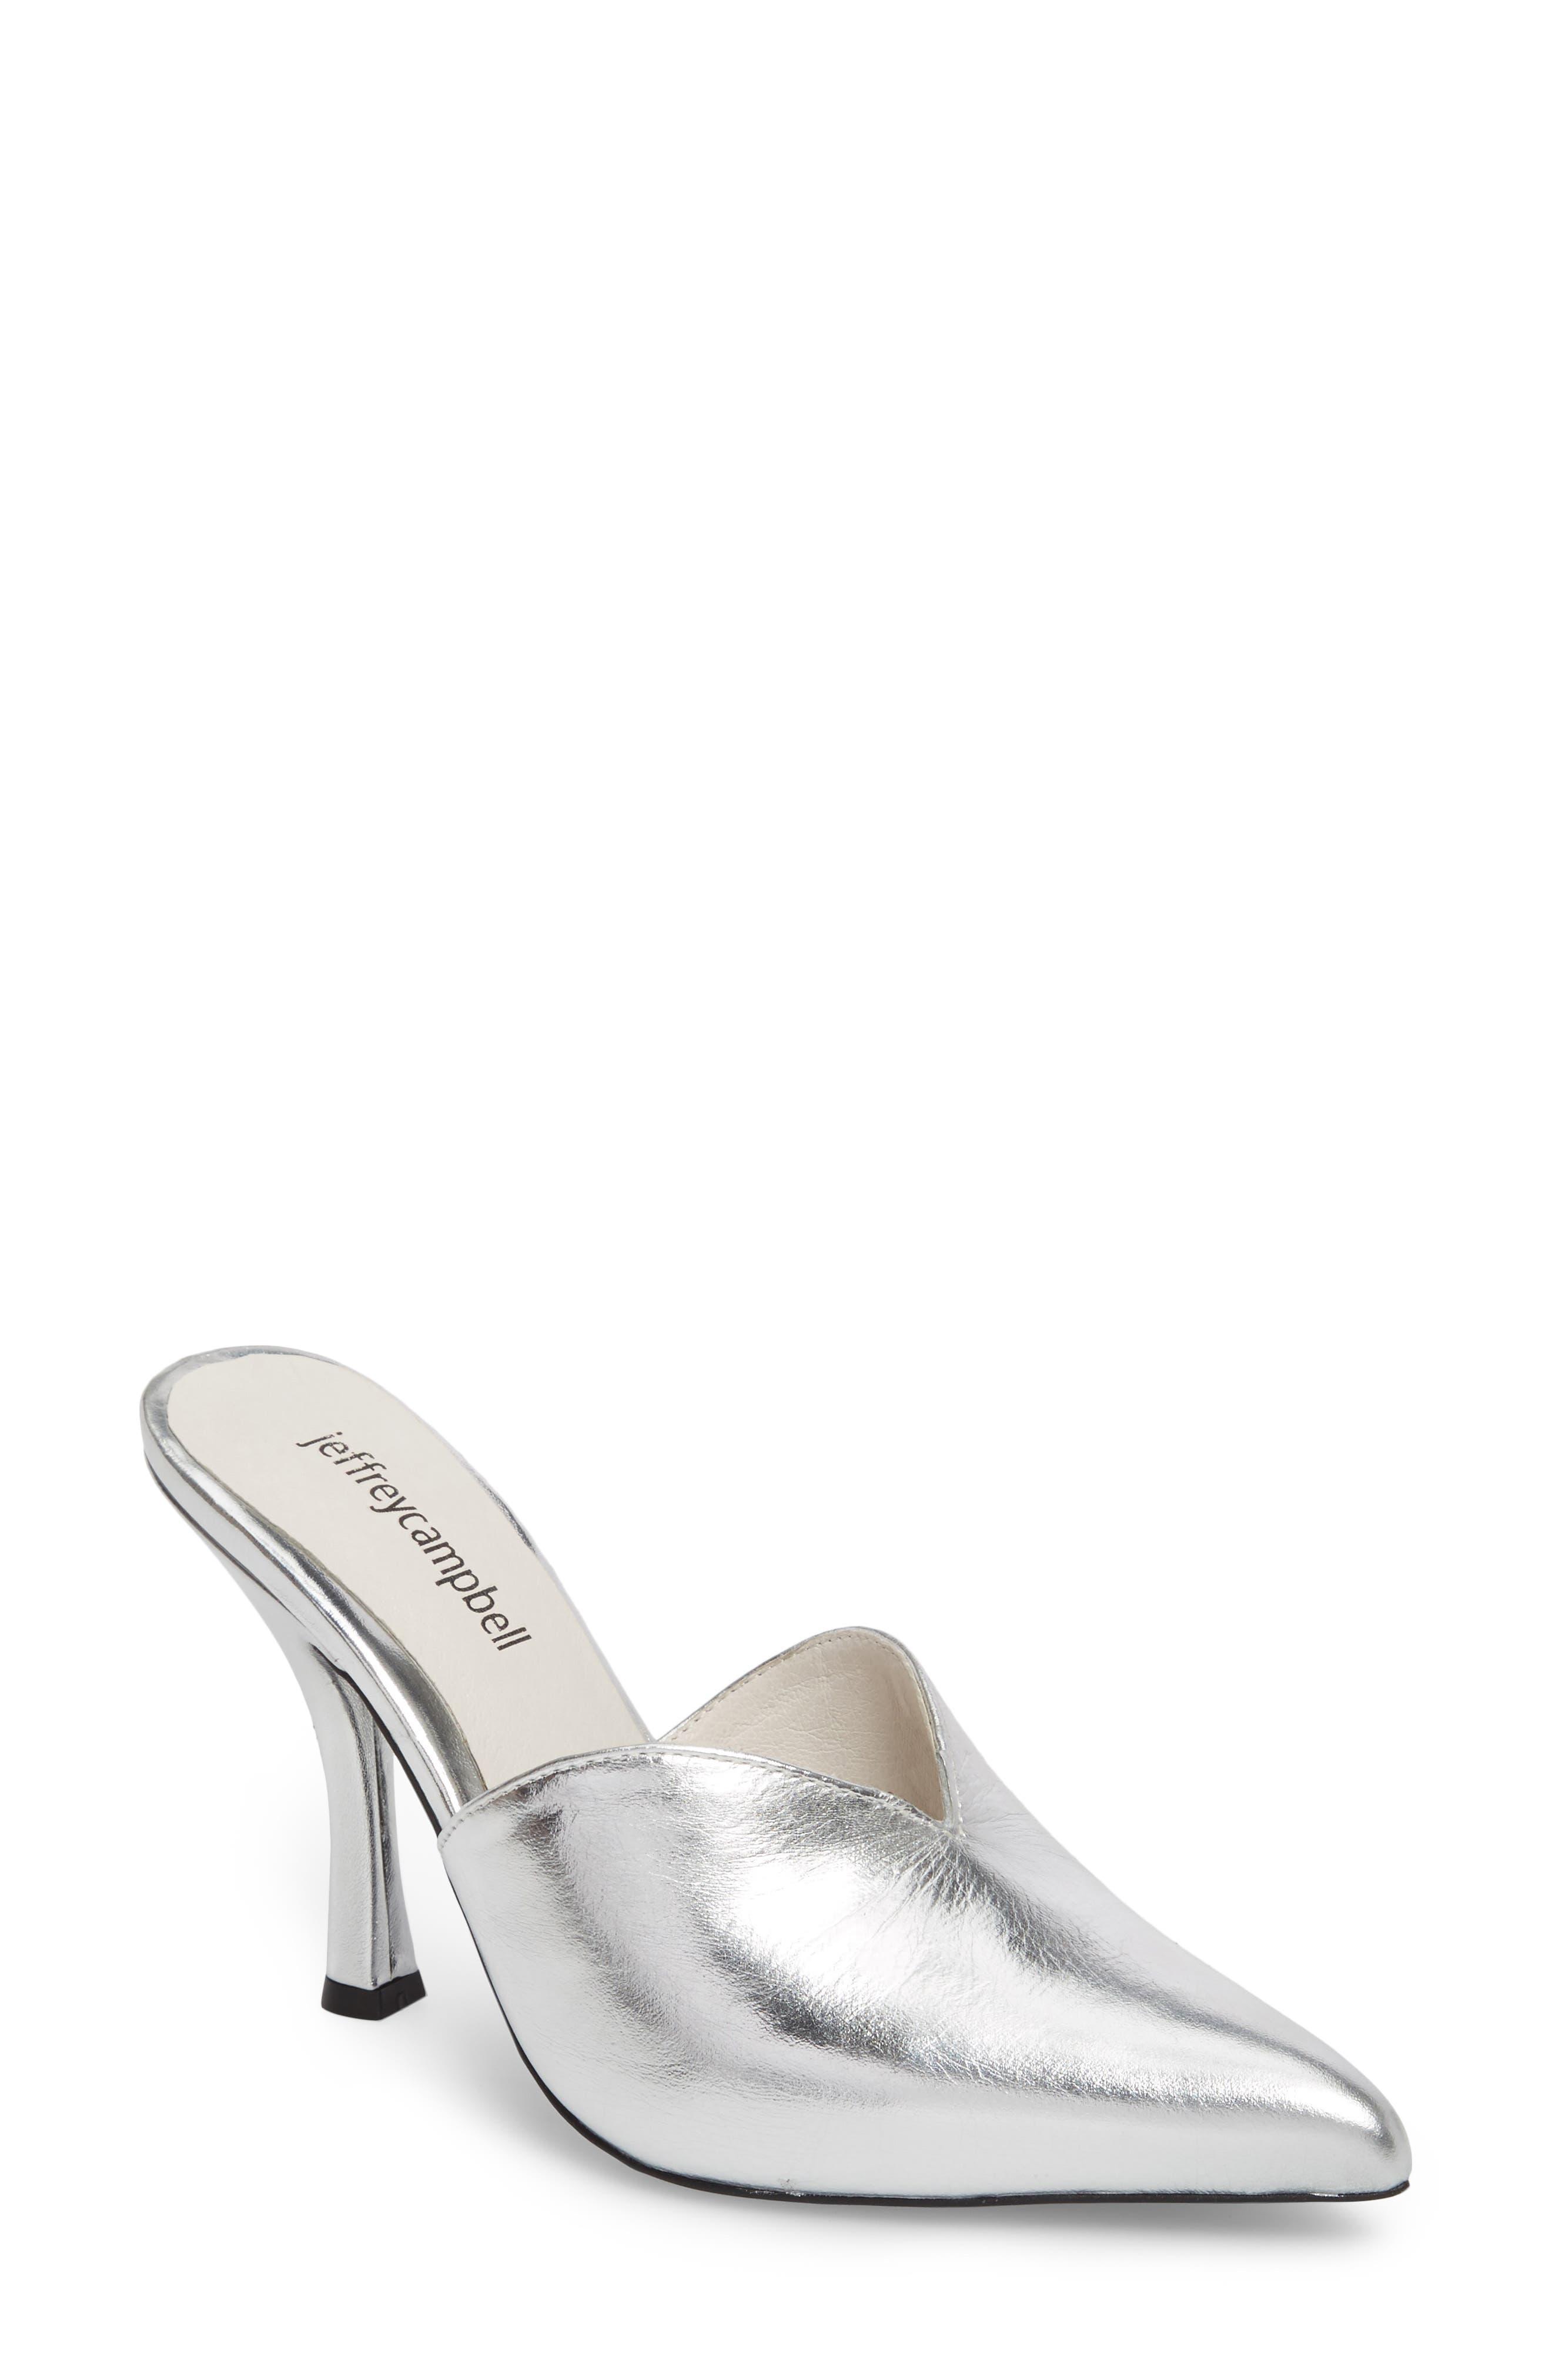 Jodeci Sweetheart Mule Pump,                         Main,                         color, Silver Leather